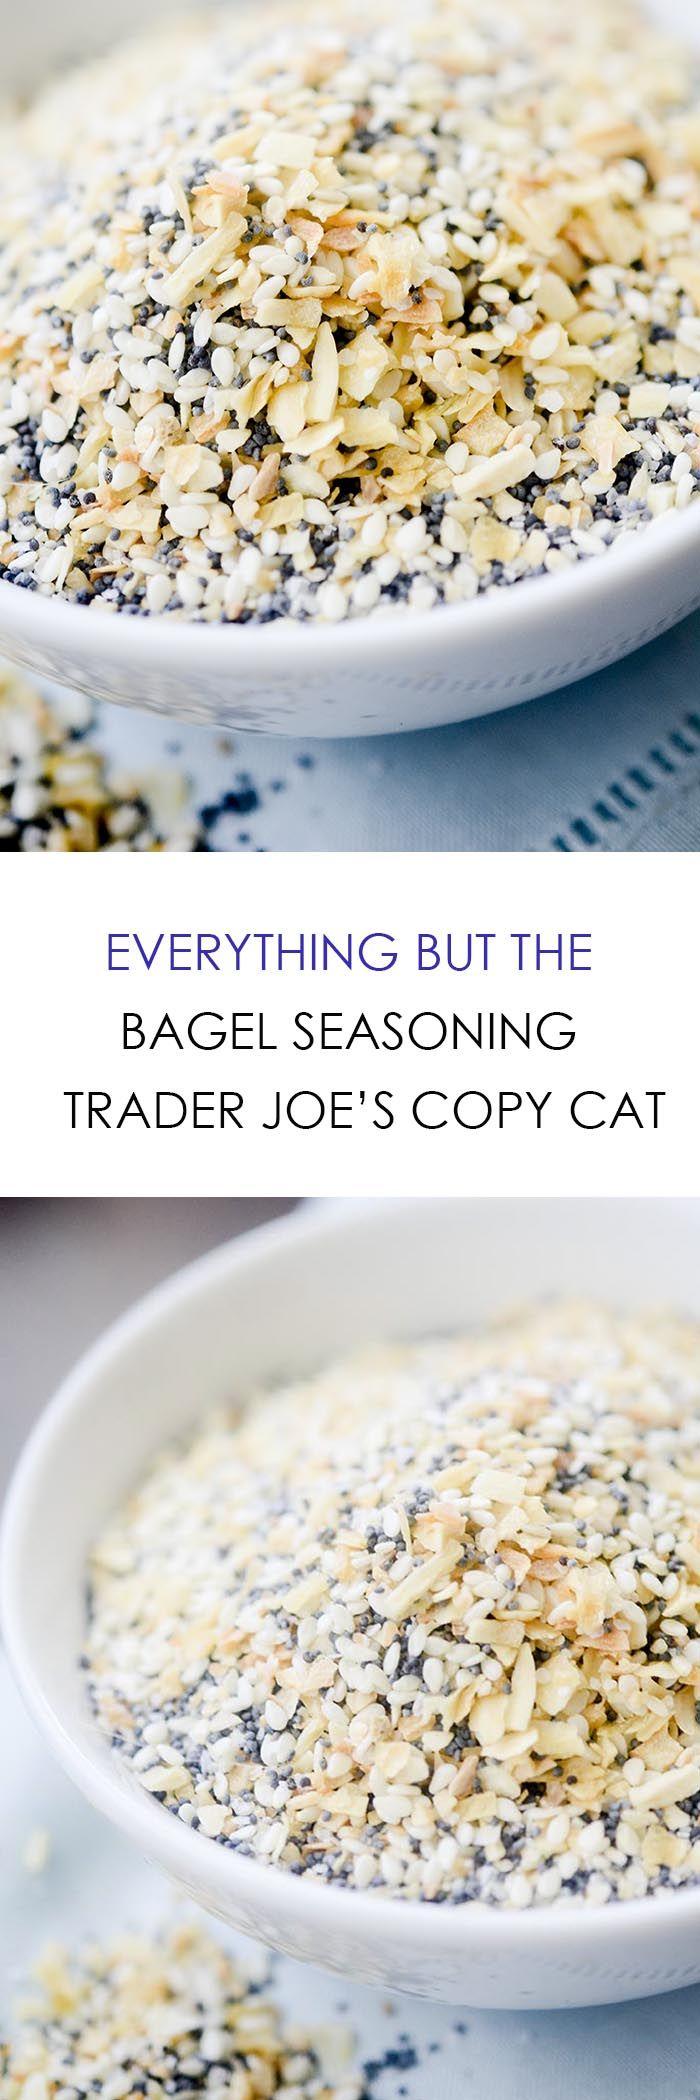 Everything but the Bagel Seasoning - Trader Joe's Copy Cat - Recipe Diaries